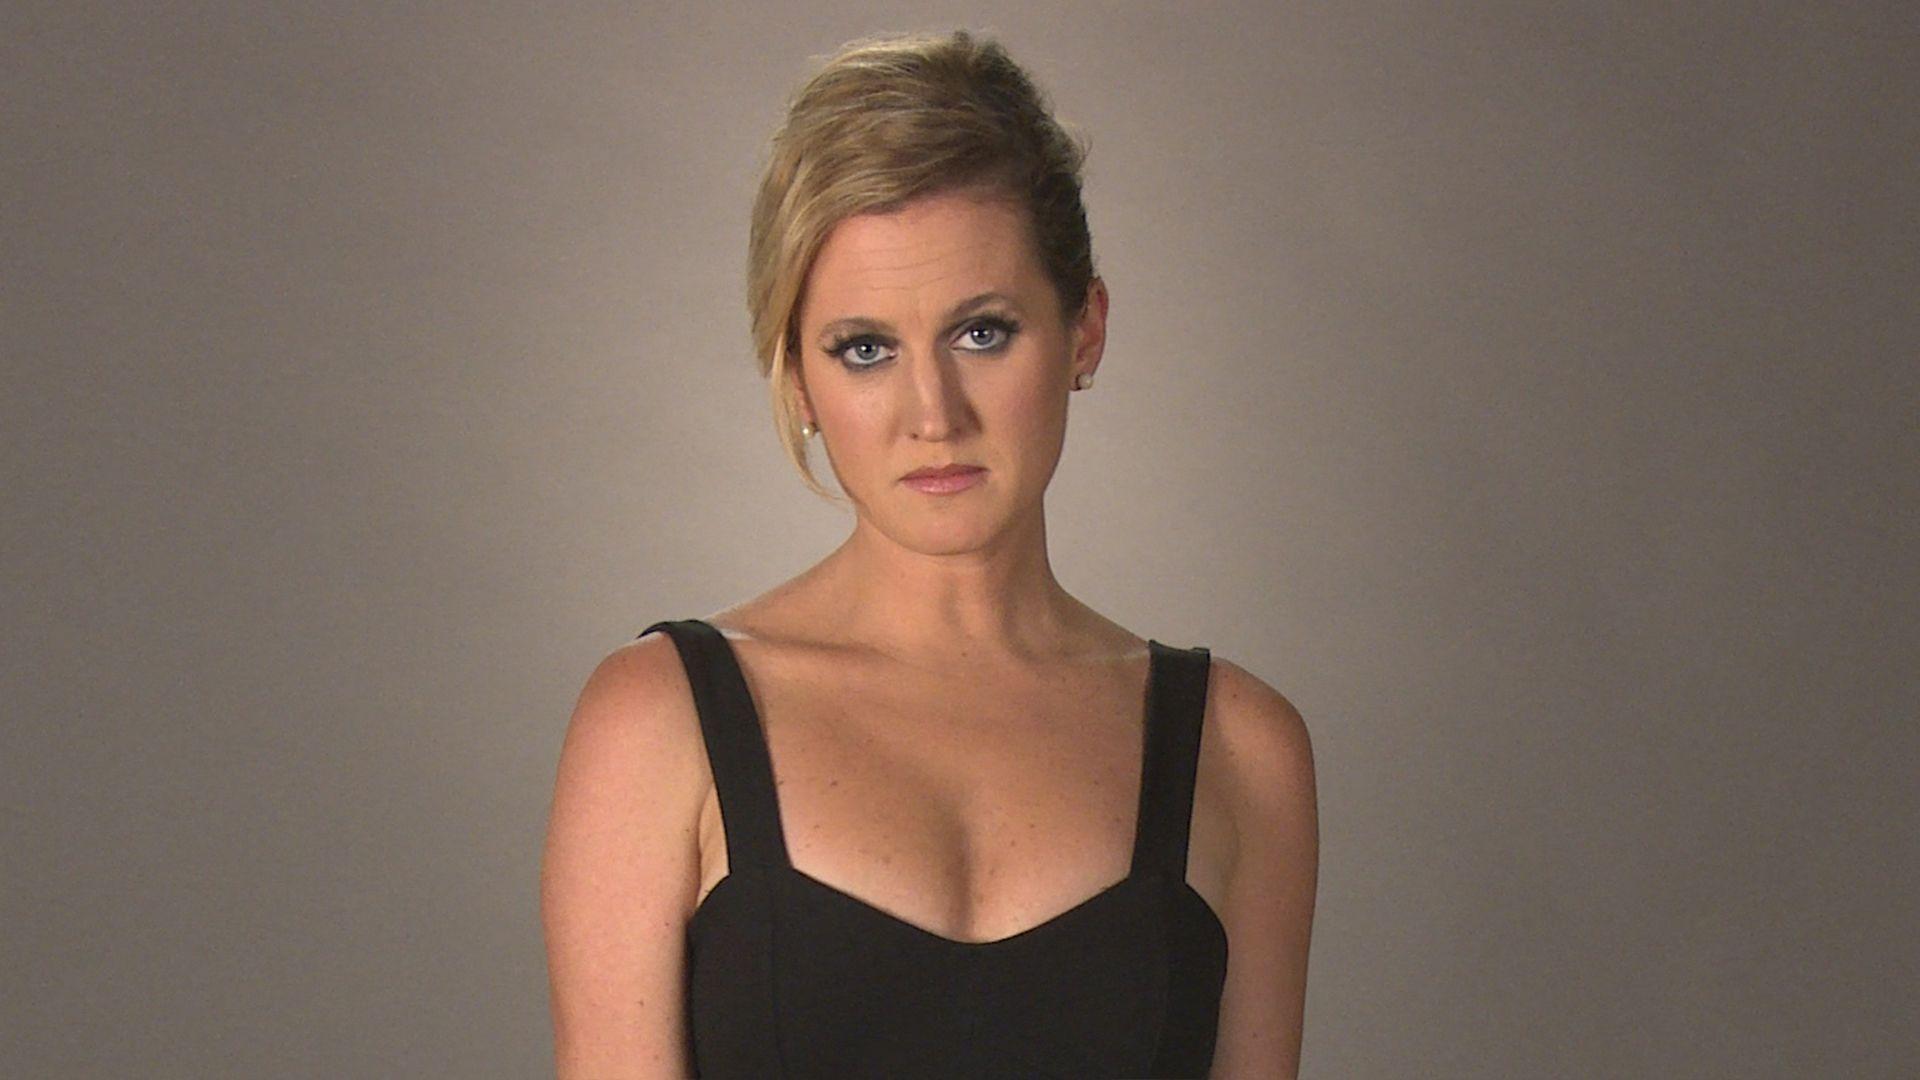 Ashley madison clears up the misunderstanding around her